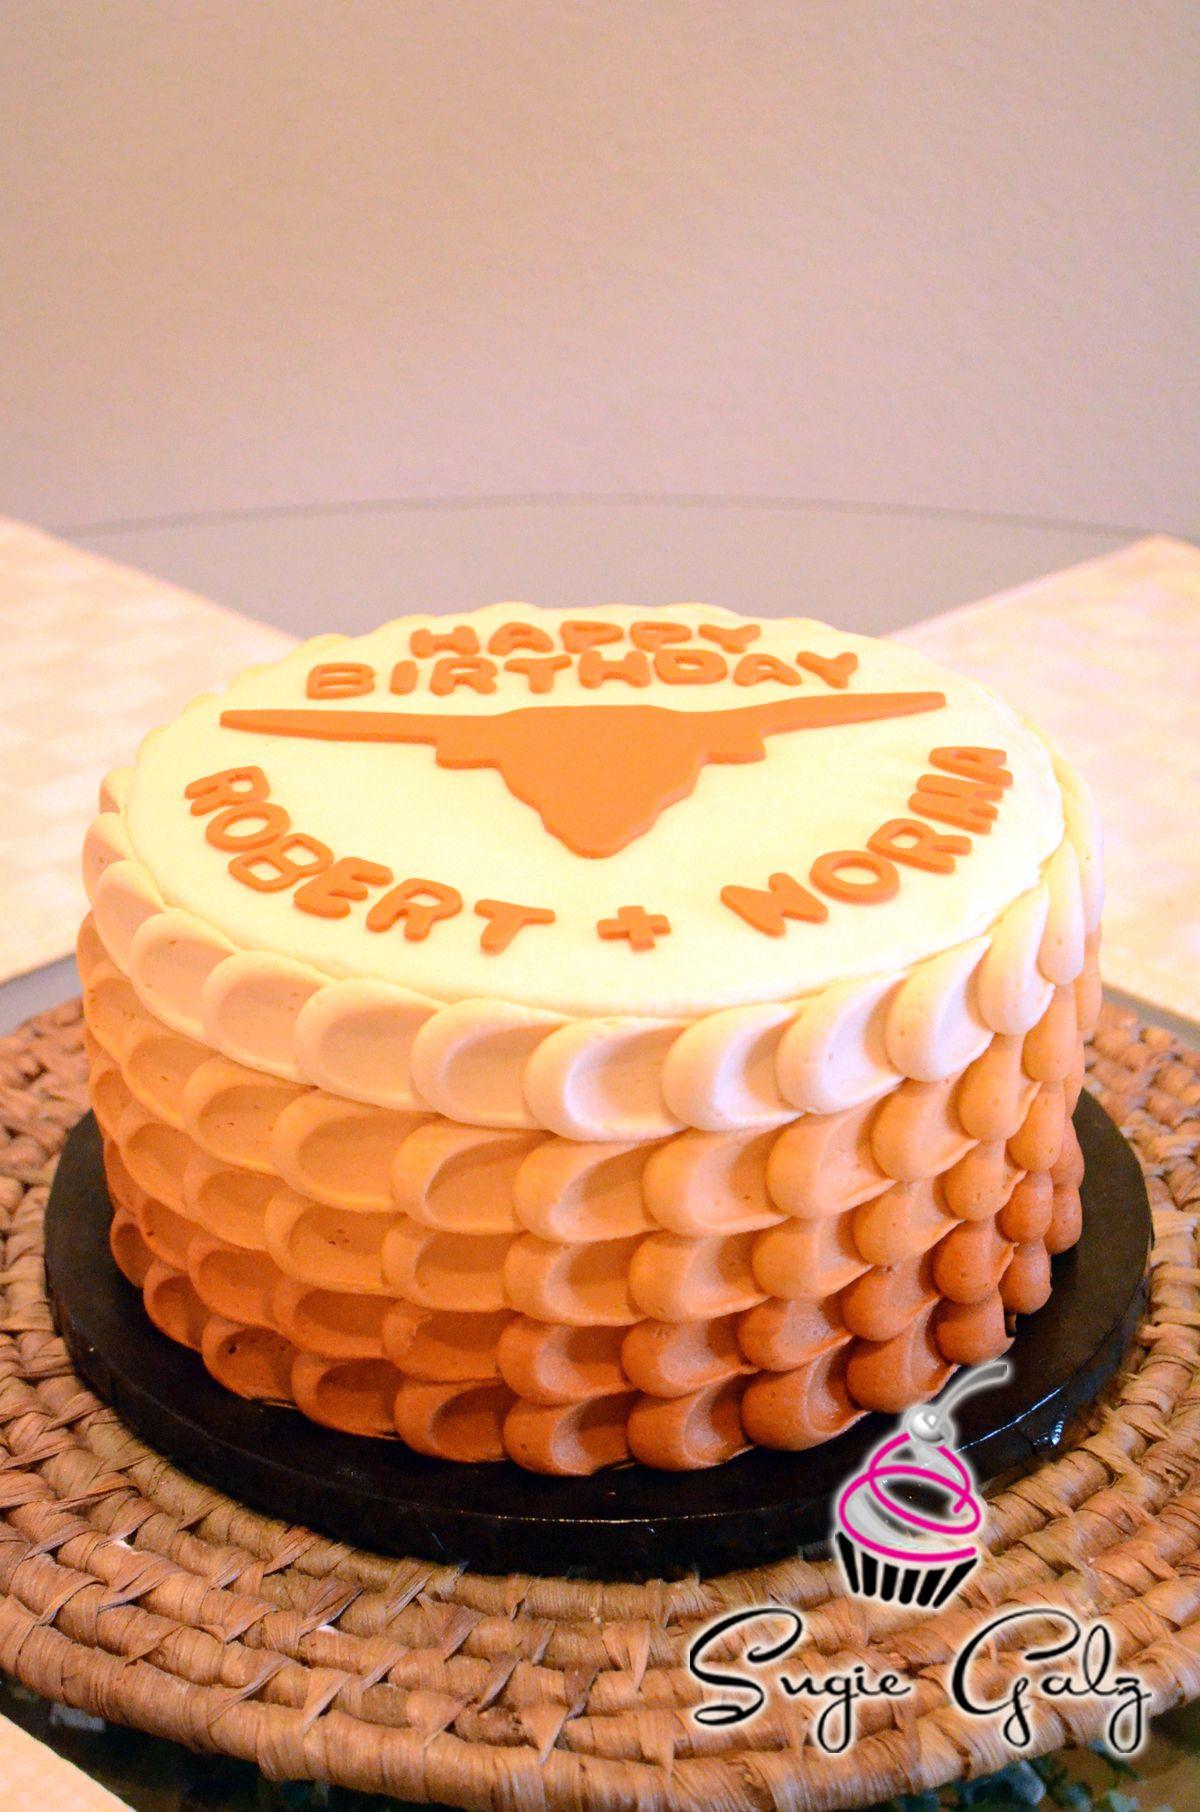 Longhorn UT Birthday Cake In Austin Texas By Sugie Galz